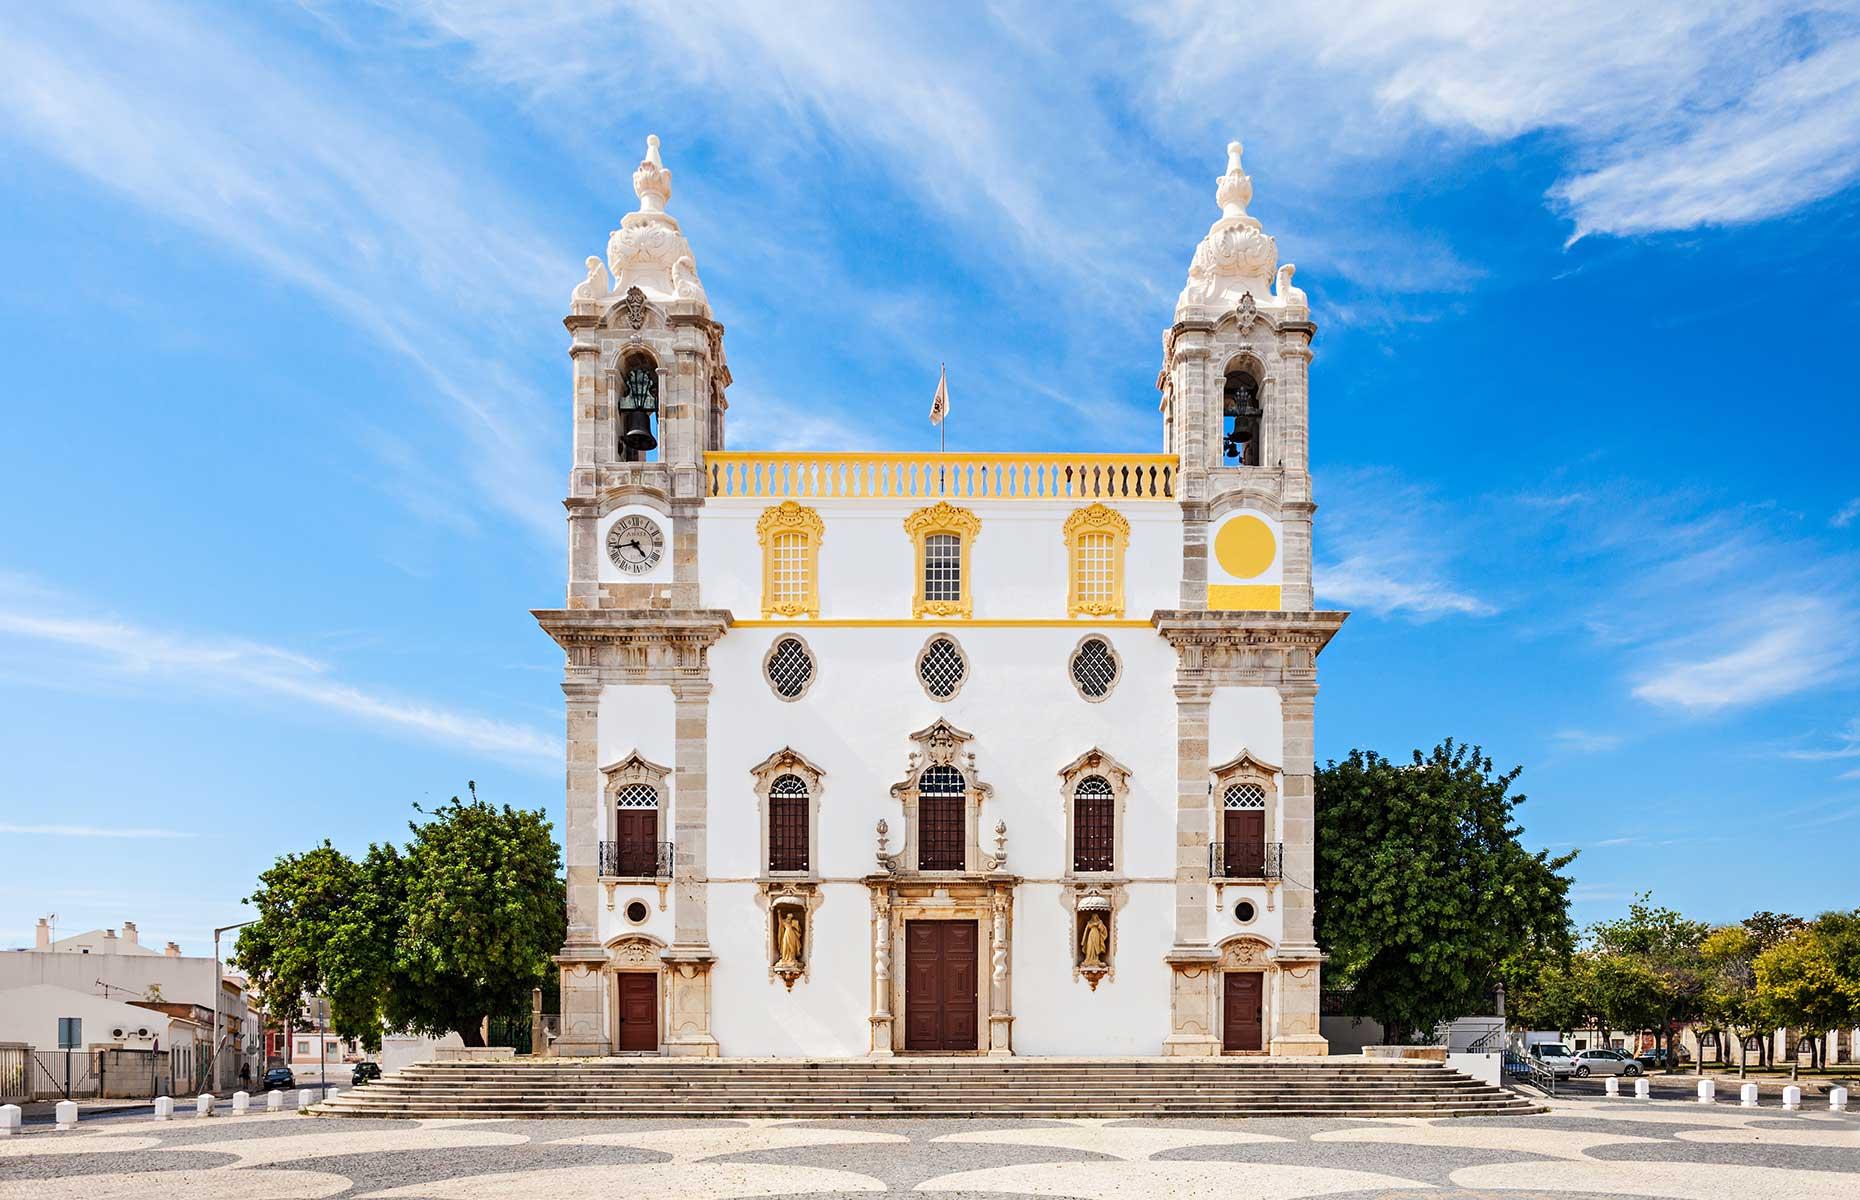 nossa Senhora do Carmo church (Image: saiko3p/Shutterstock)